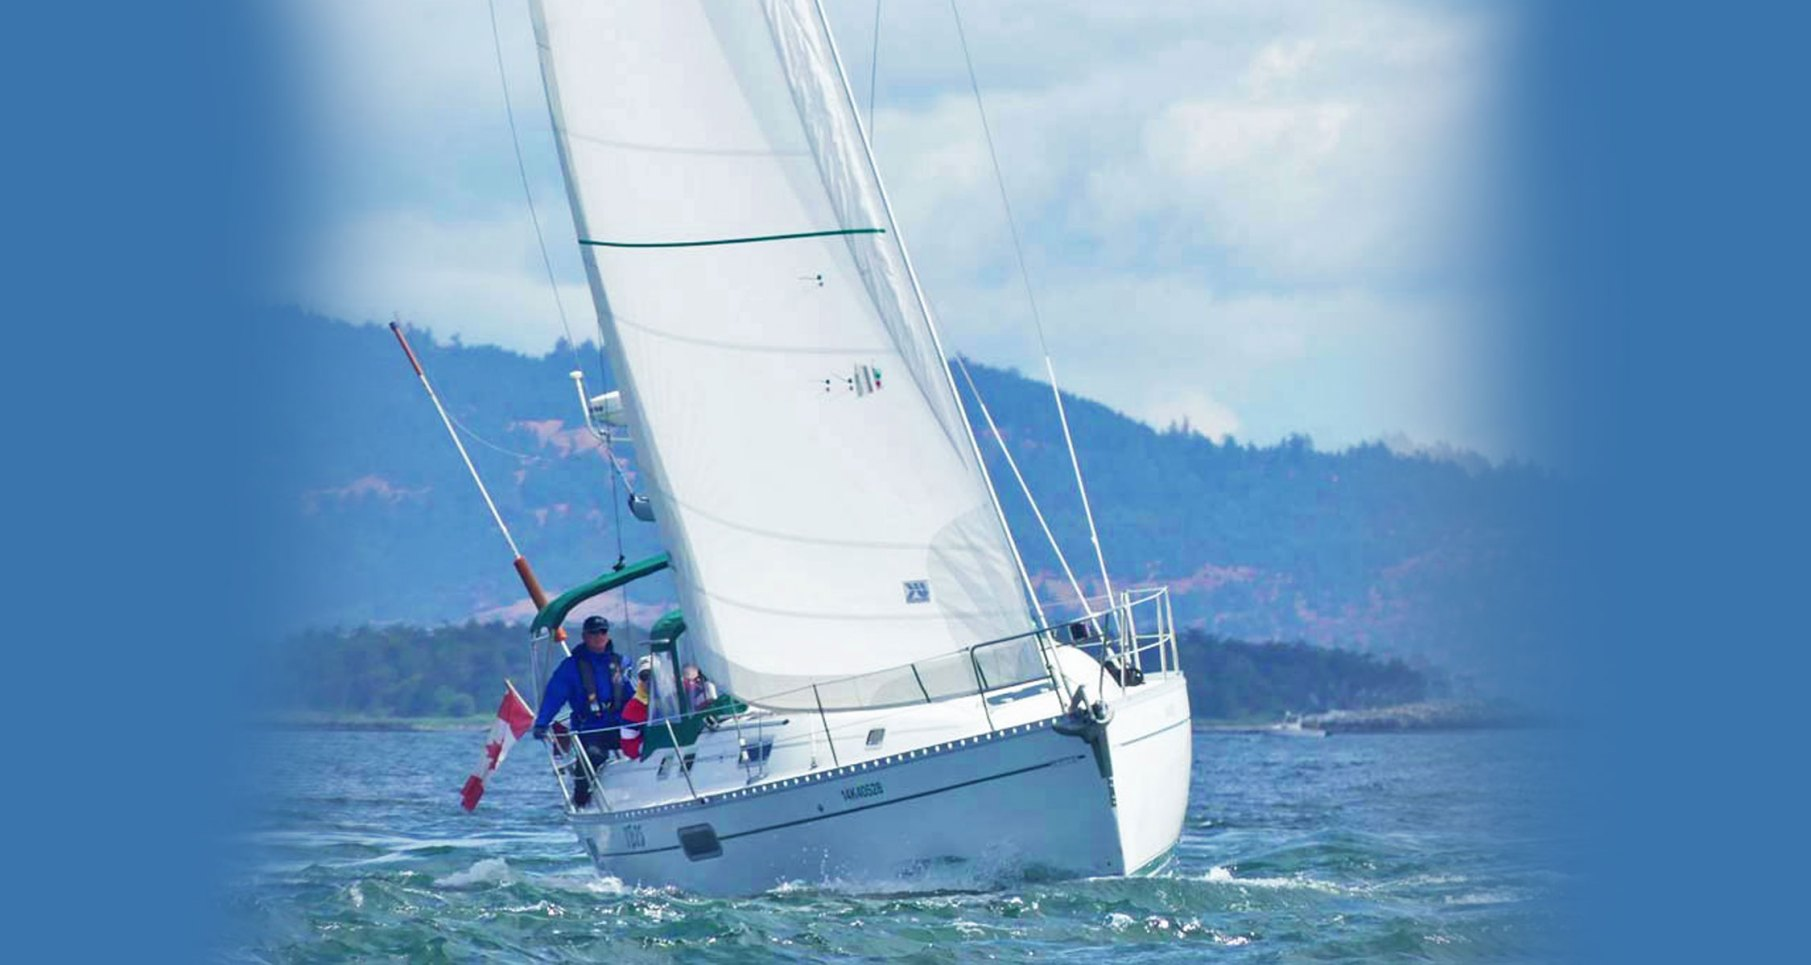 Day Sails Victoria BC – Blackfish Sailing Adventures